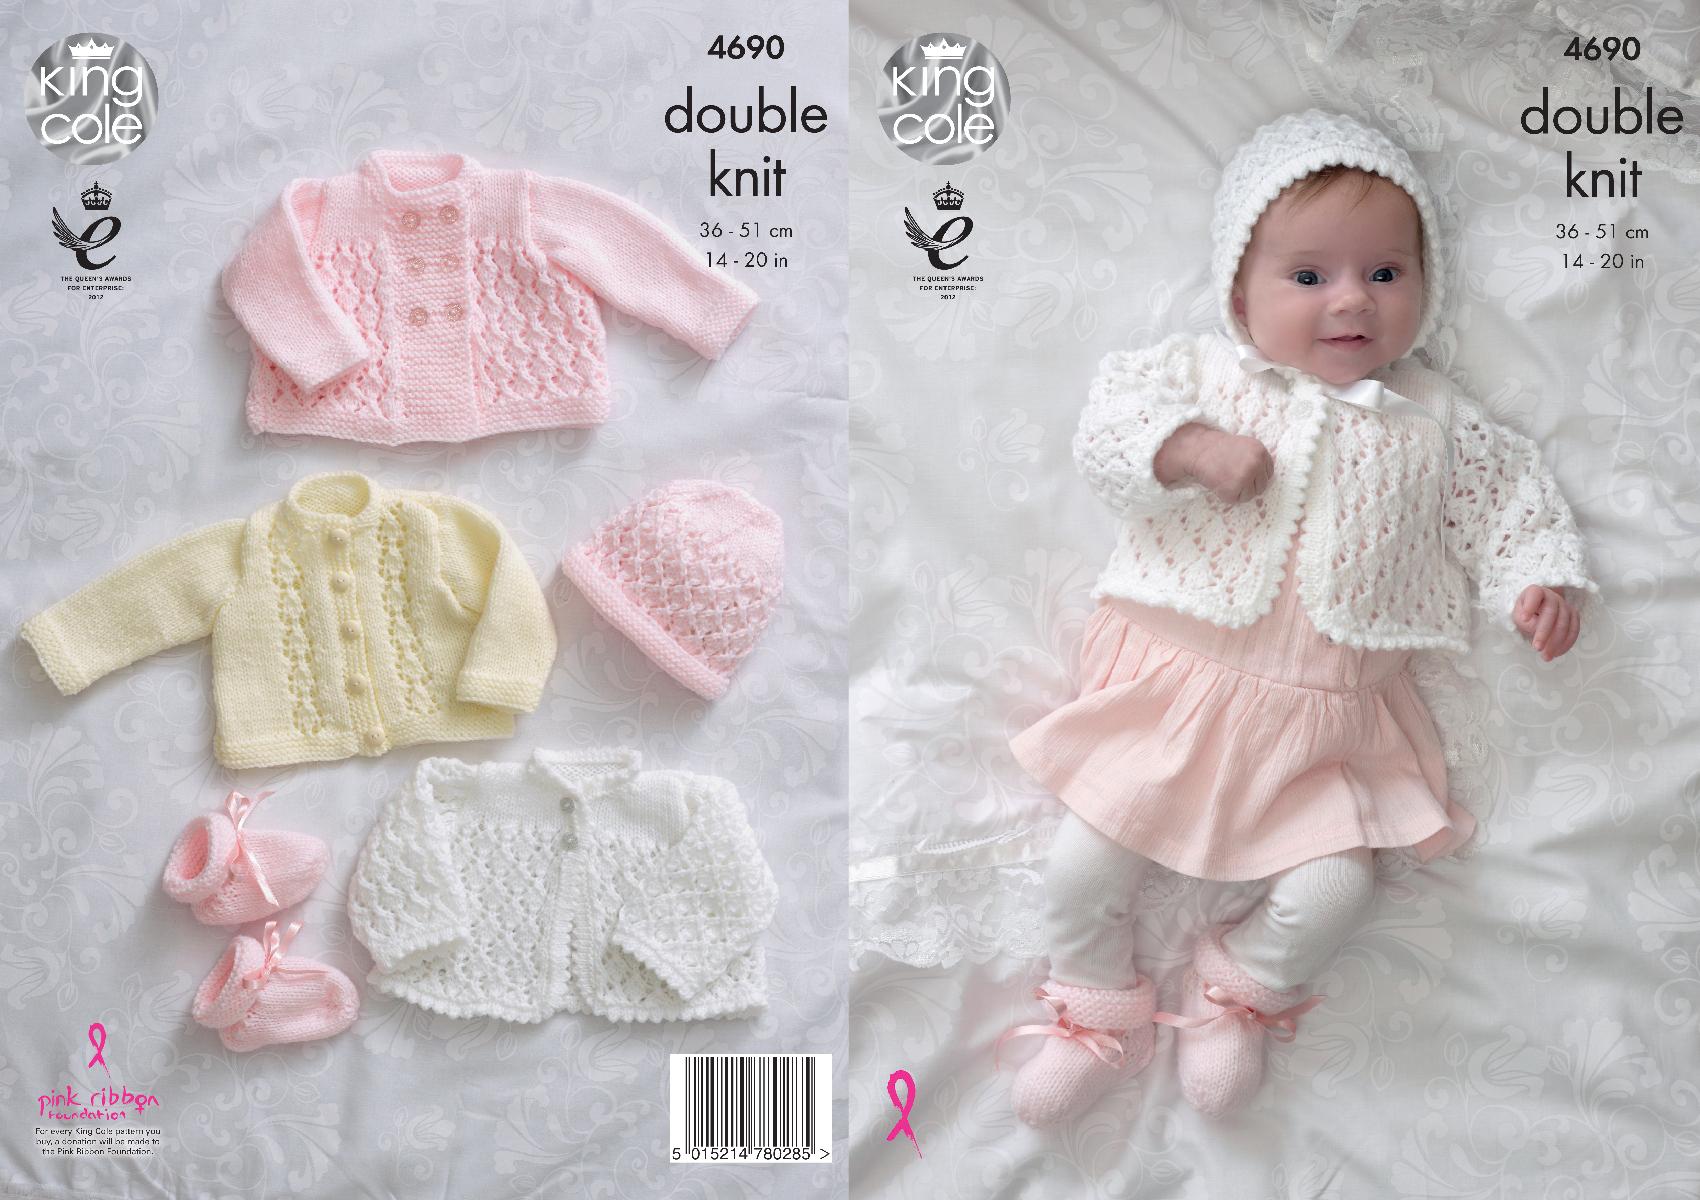 Baby Matinee Coat Knitting Patterns : Knitting pattern baby matinee jacket cardigan bonnet